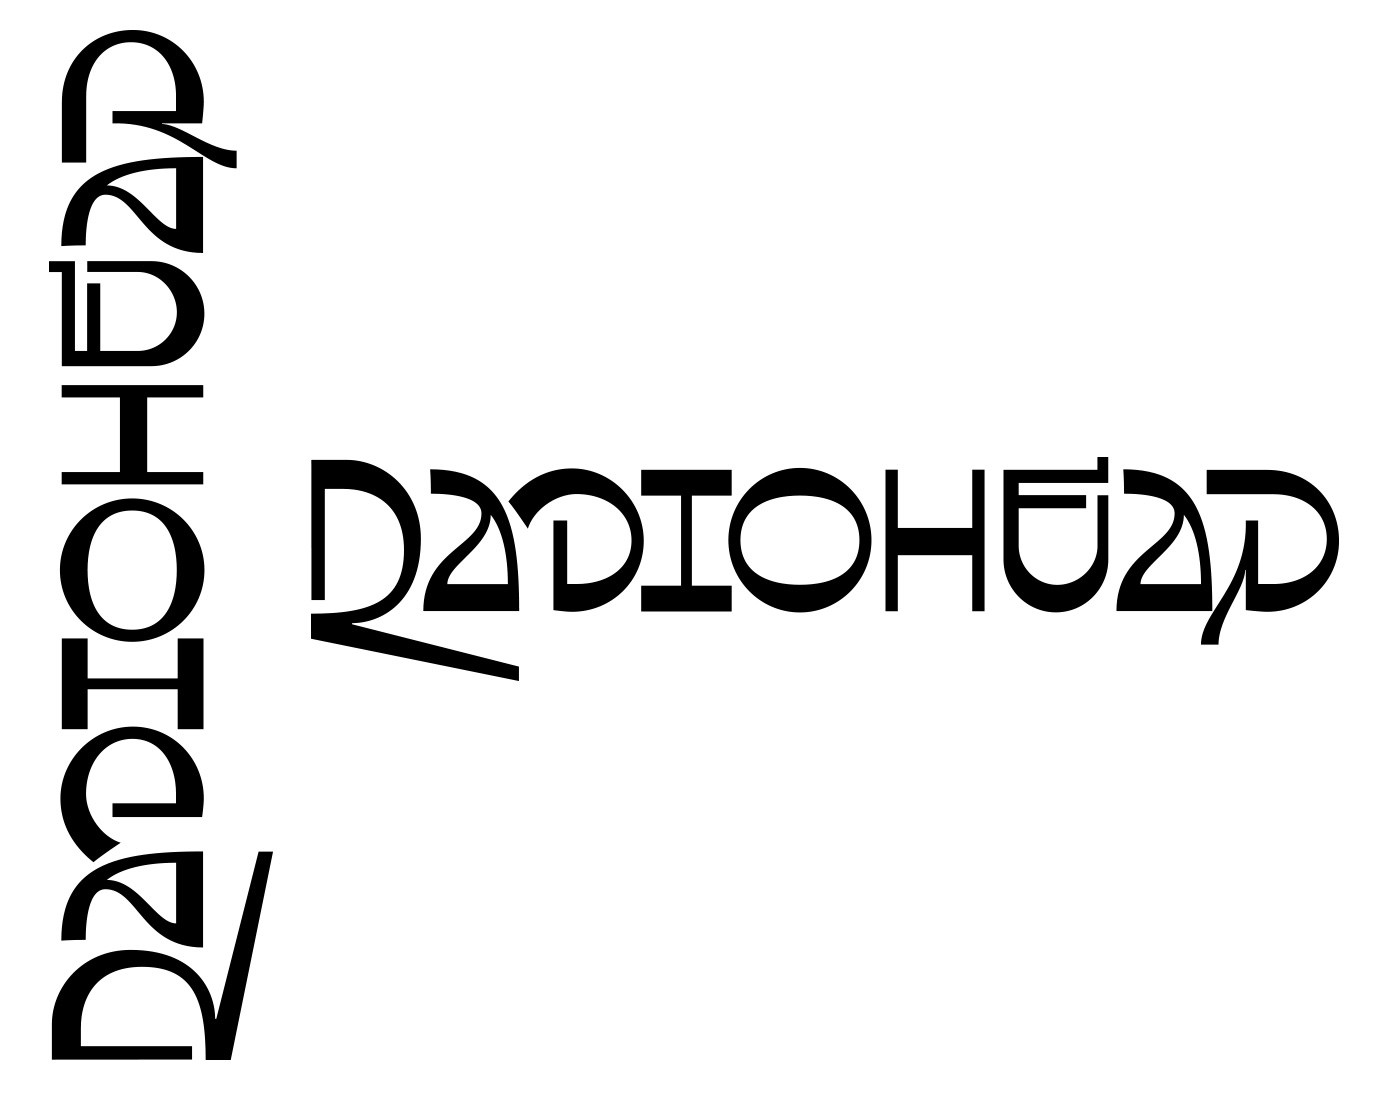 2009-04-21_Radiohead